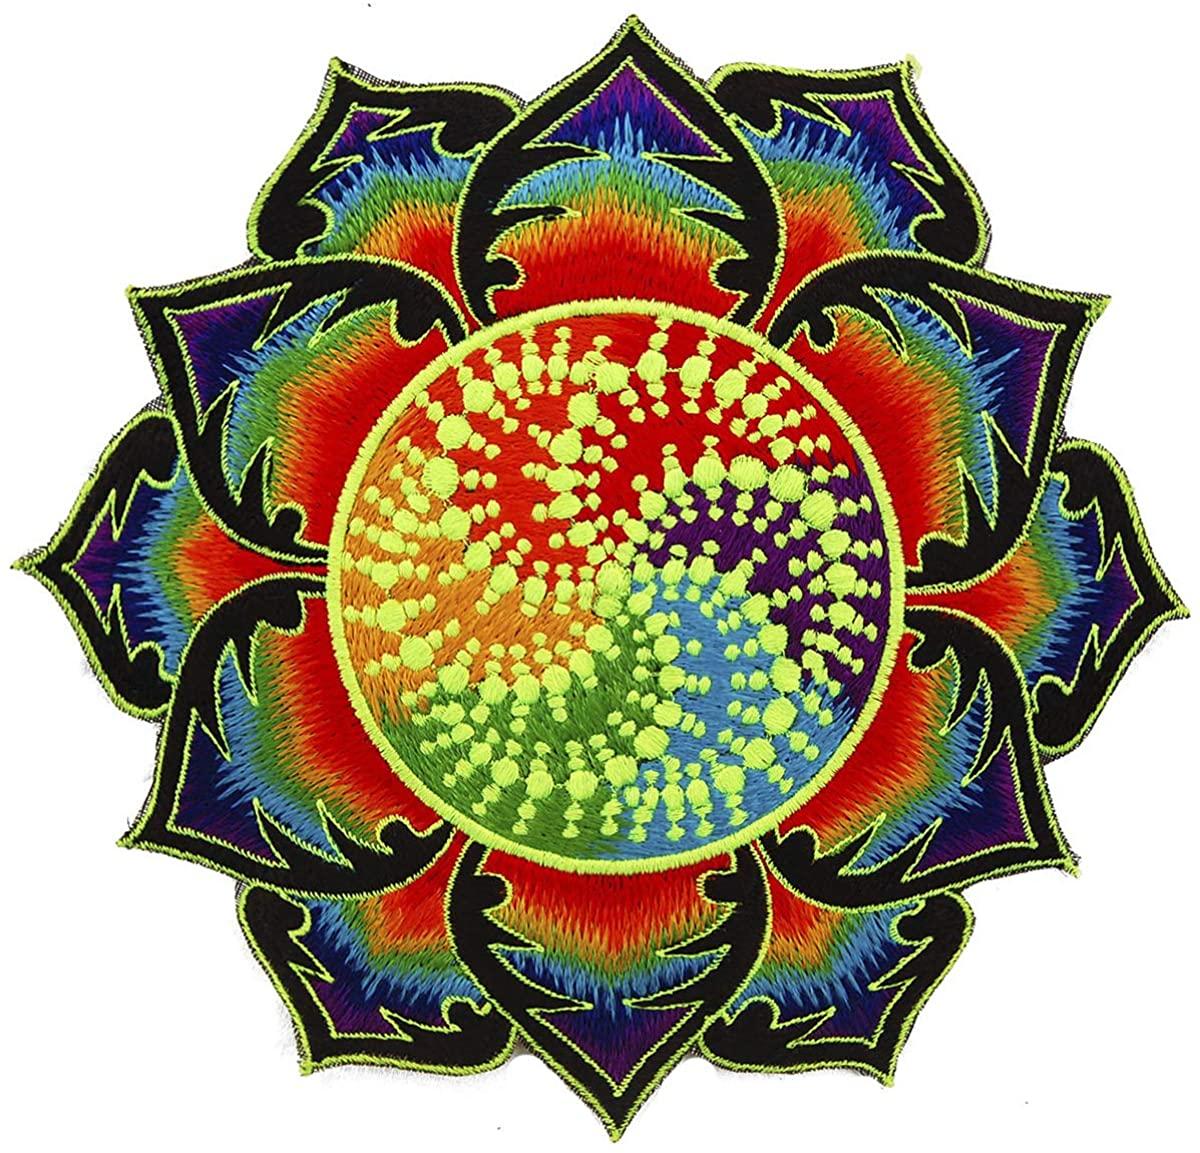 ImZauberwald Rainbow Fractal Crop Circle patch ~7inch handmade psychedelic art